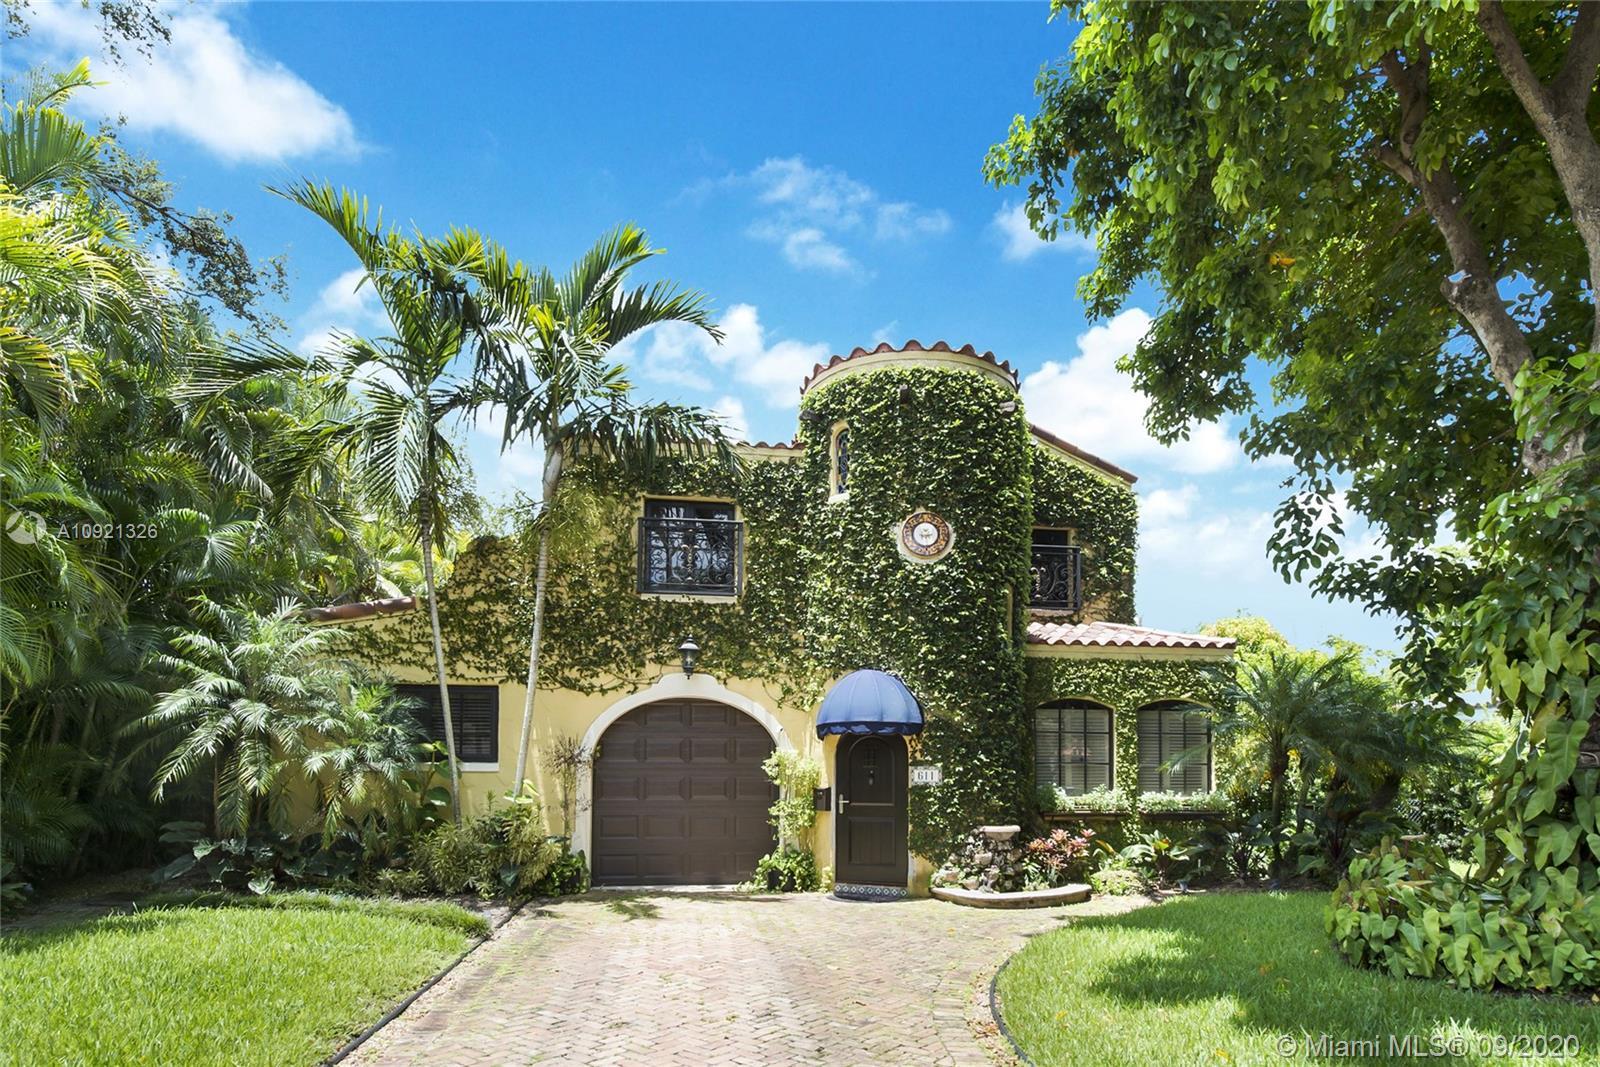 South Miami - 611 San Antonio Ave., Coral Gables, FL 33146